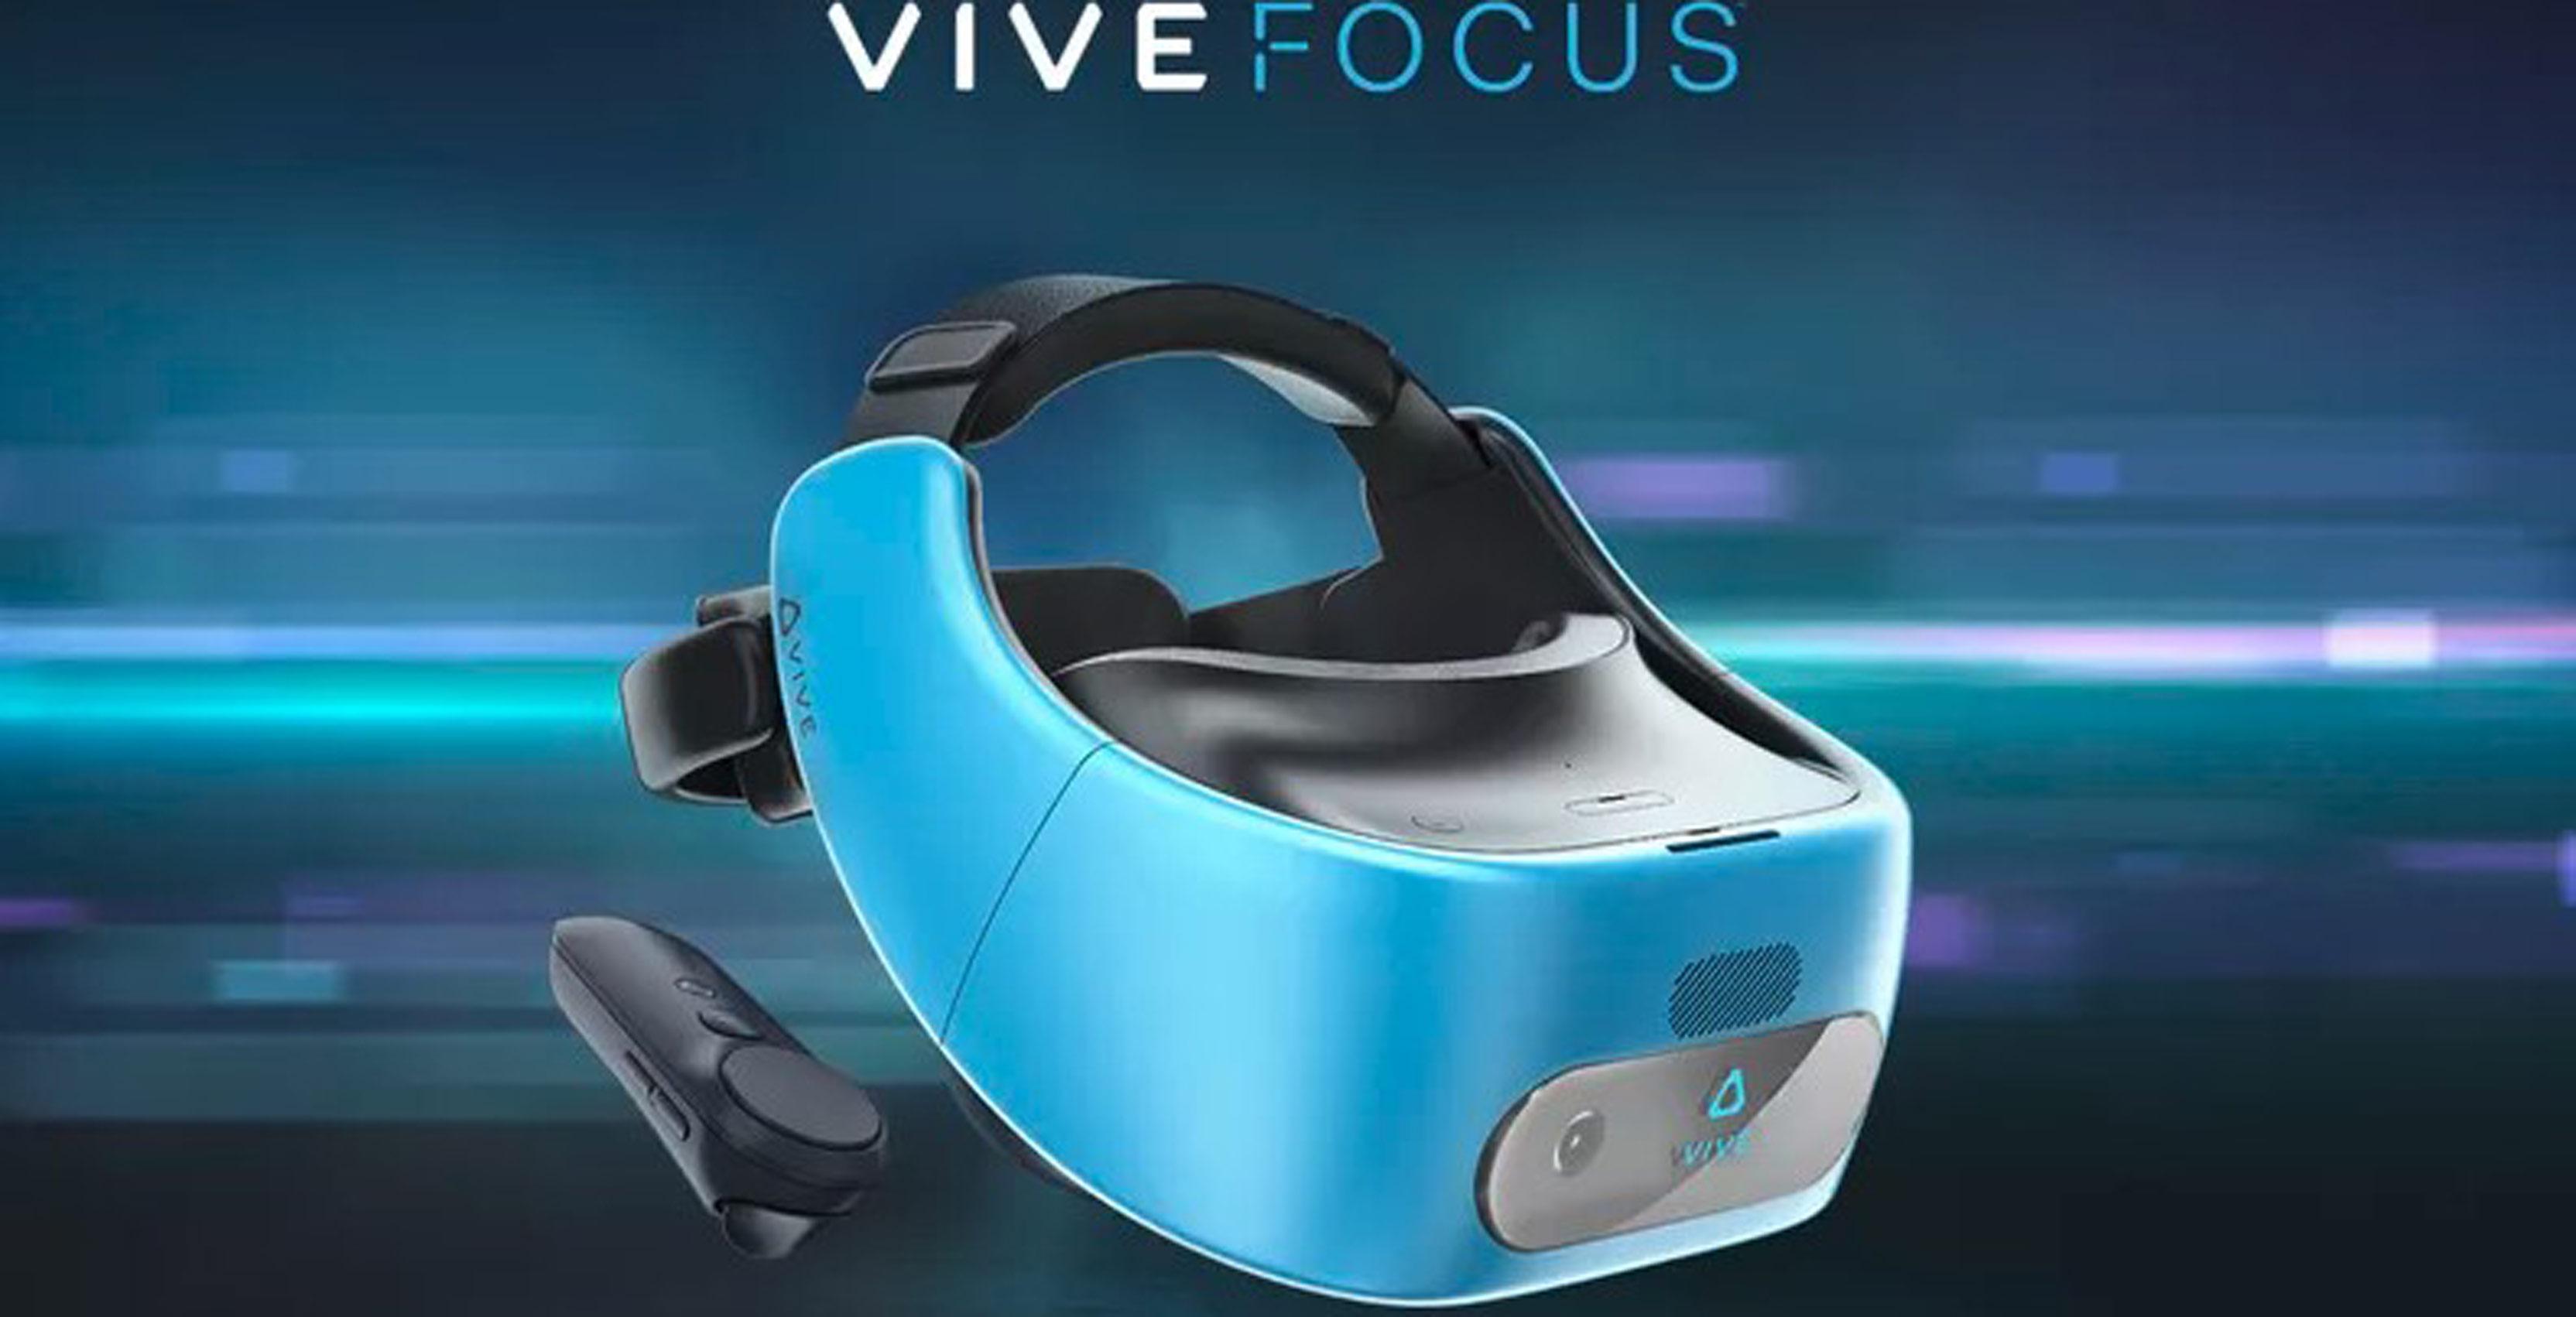 HTC Vive Focus VR headset